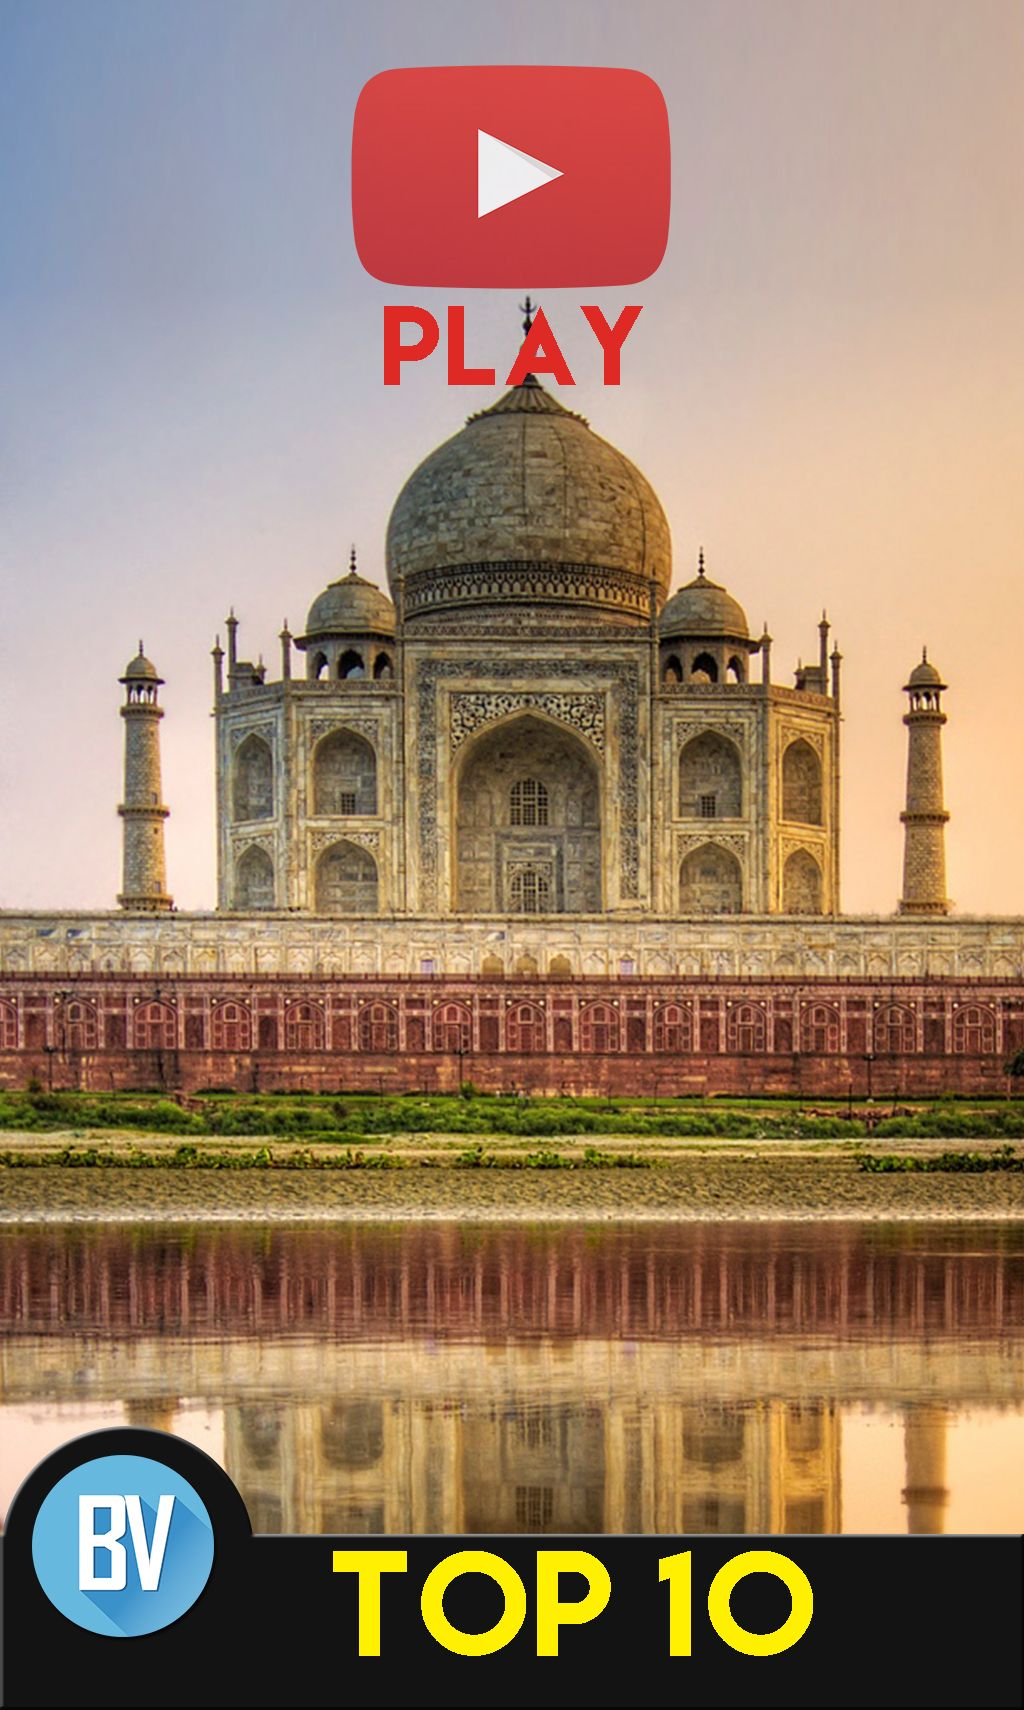 Top 10 Most Beautiful Places to Visit in India Taj mahal